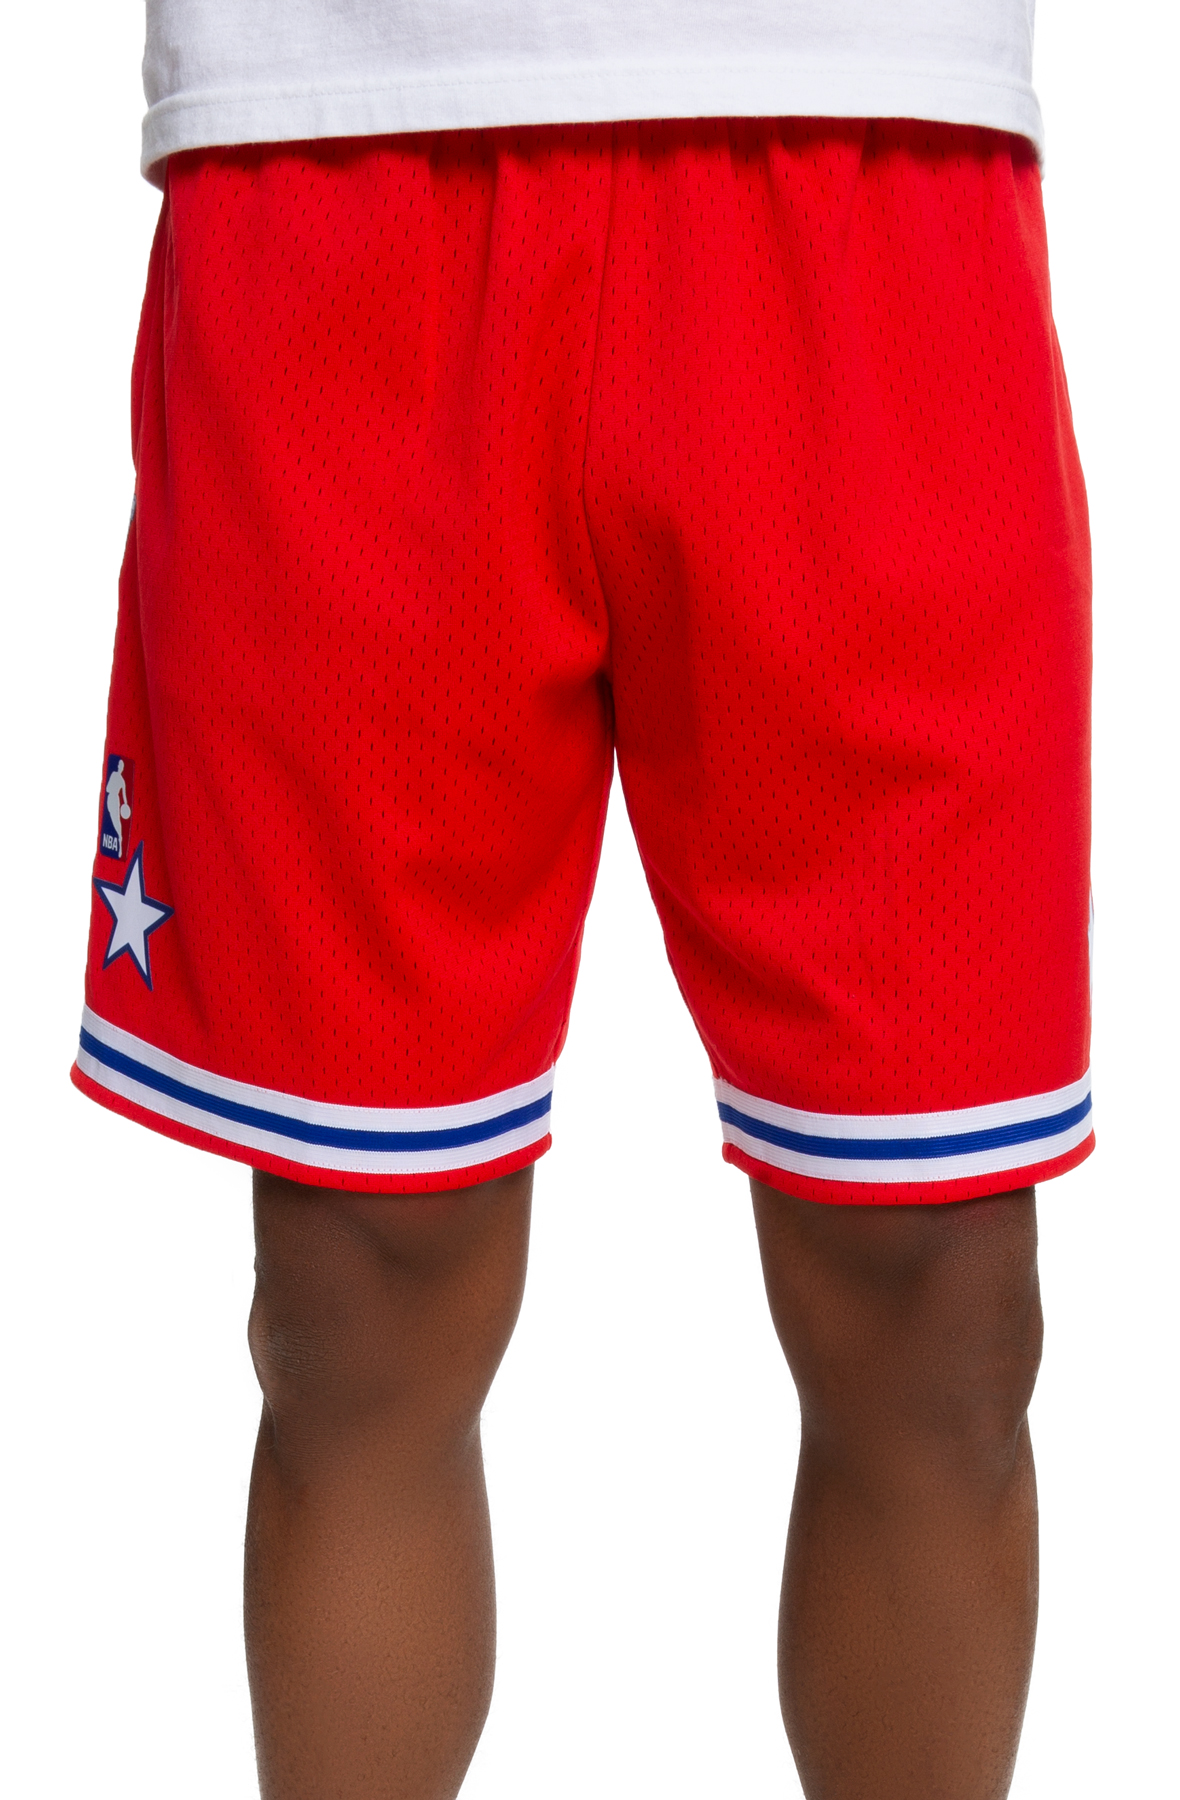 all-star west 1988 swingman shorts